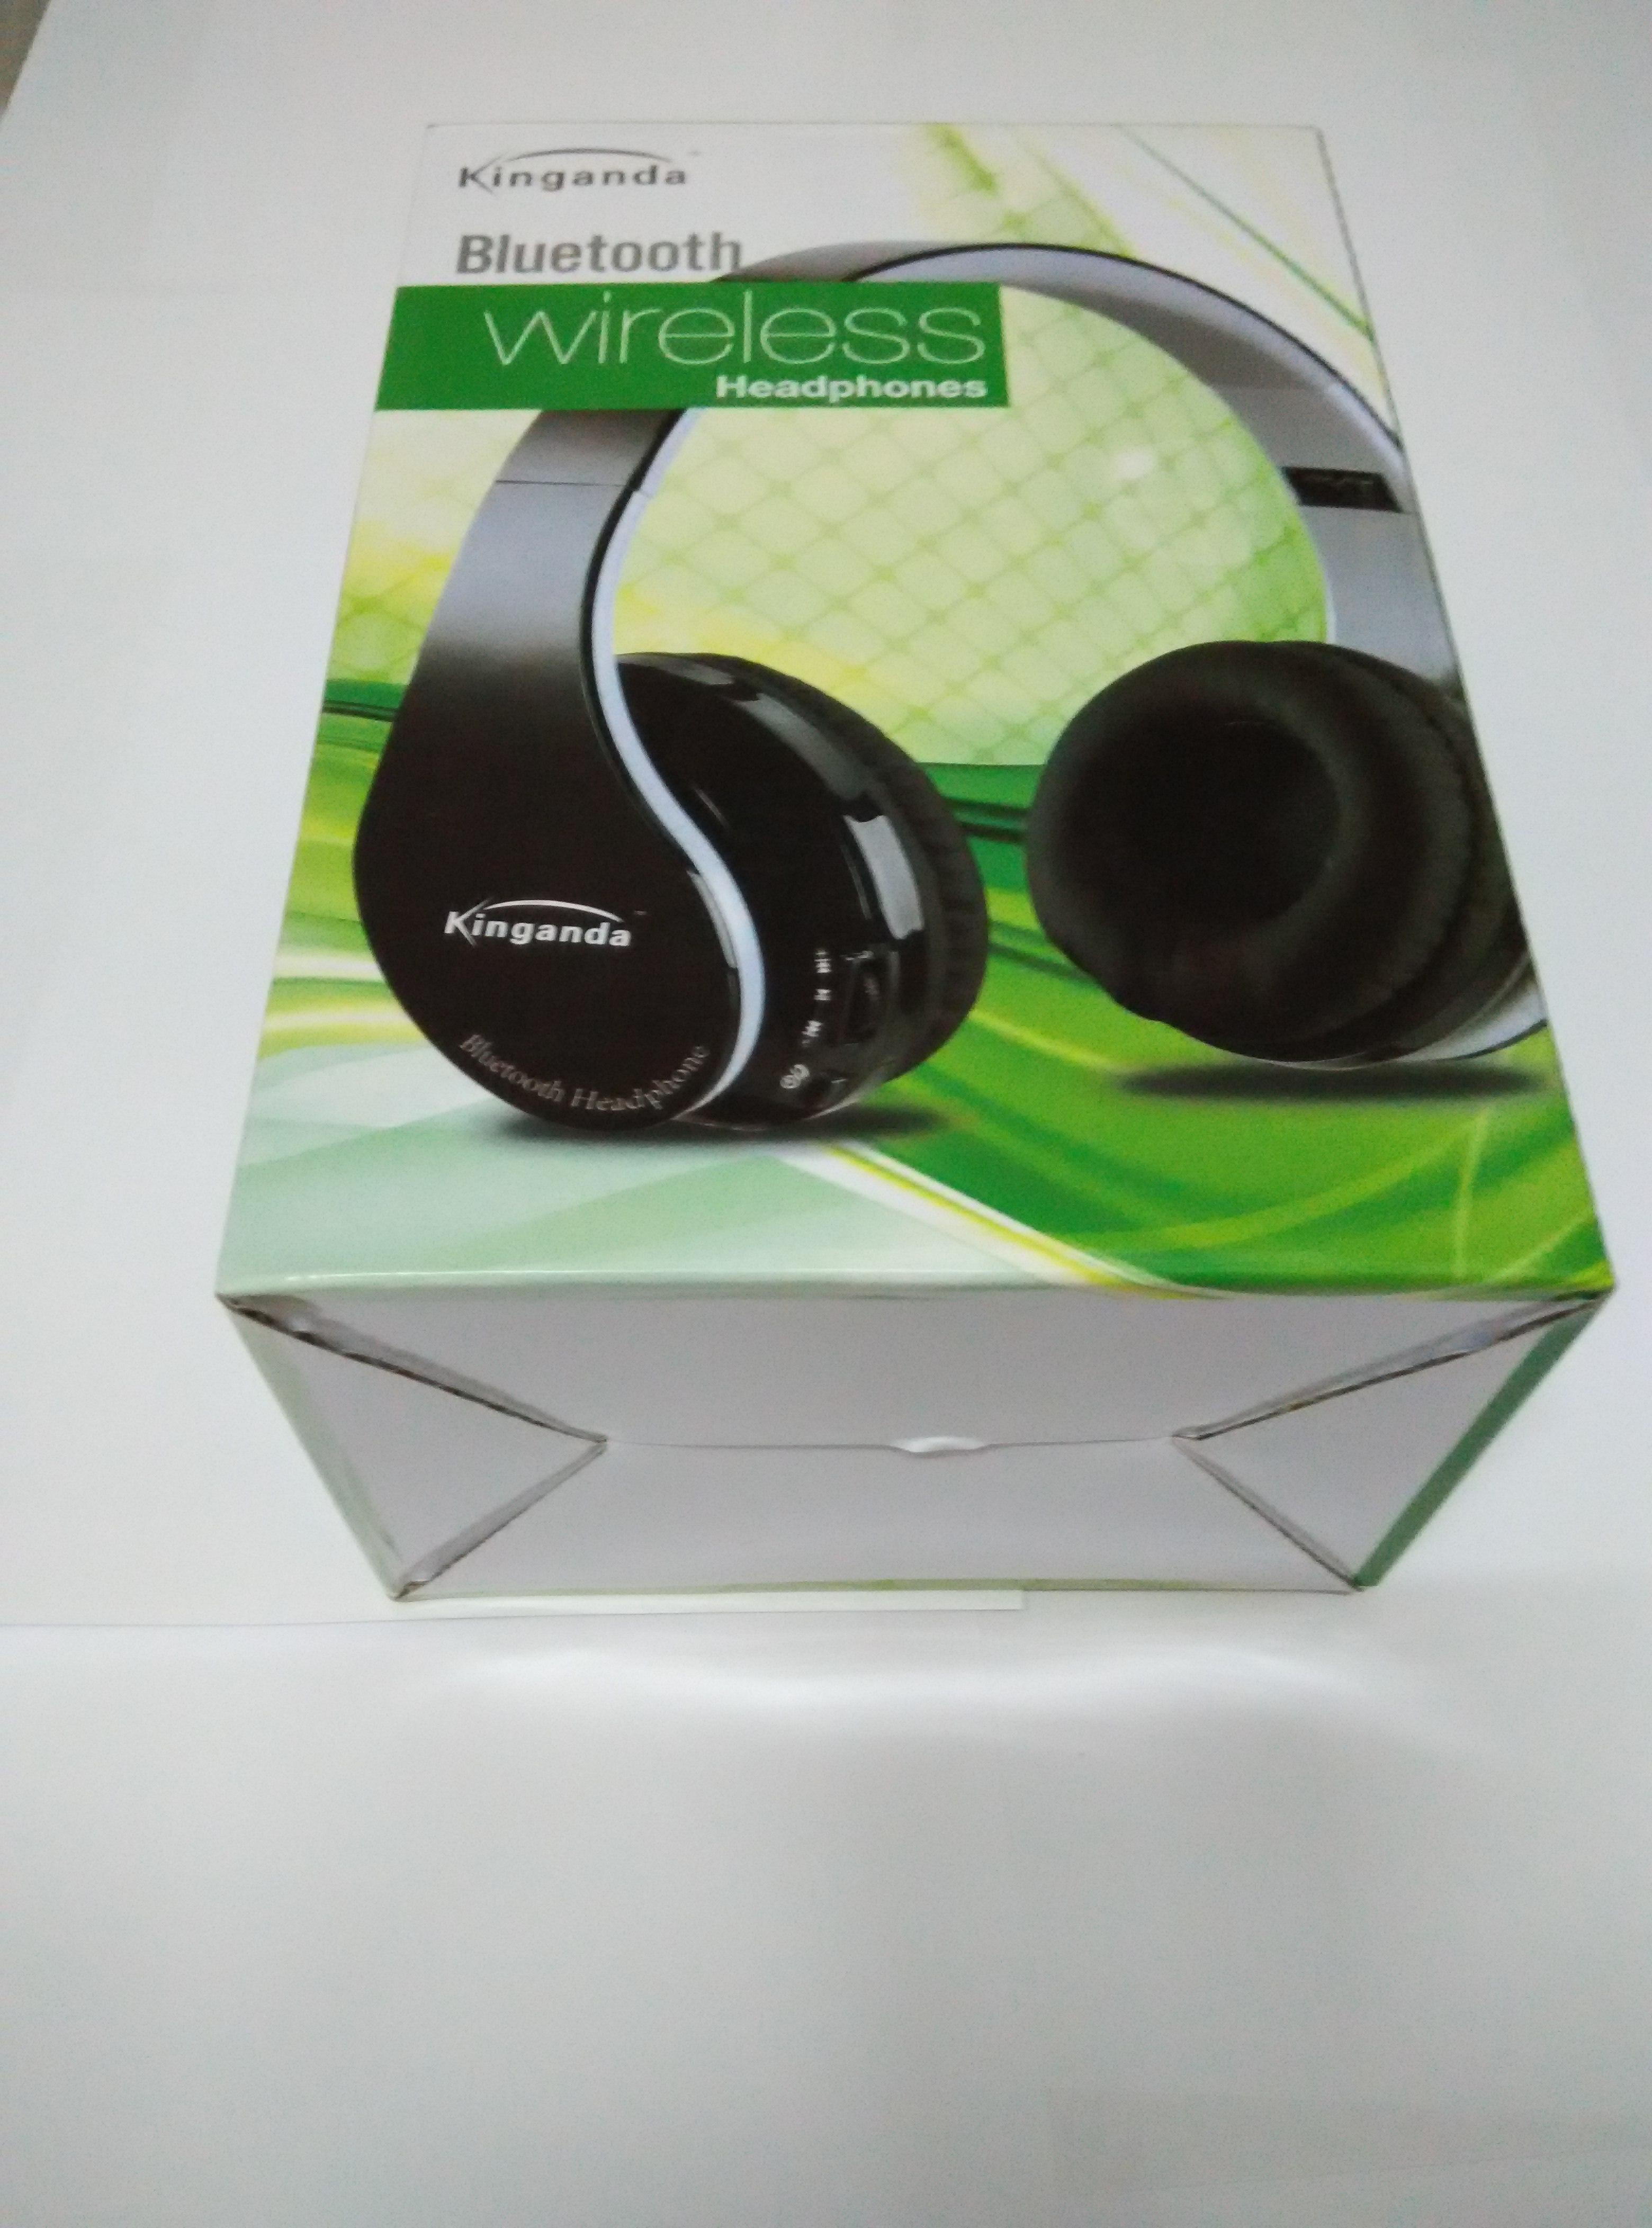 Beyution V4 1 Bluetooth Wireless Foldable Hi Fi Stereo Headphone For Smart  Phones & Tablets Blac KingandaiPhone,IPad,IPod,Android Best Headphones